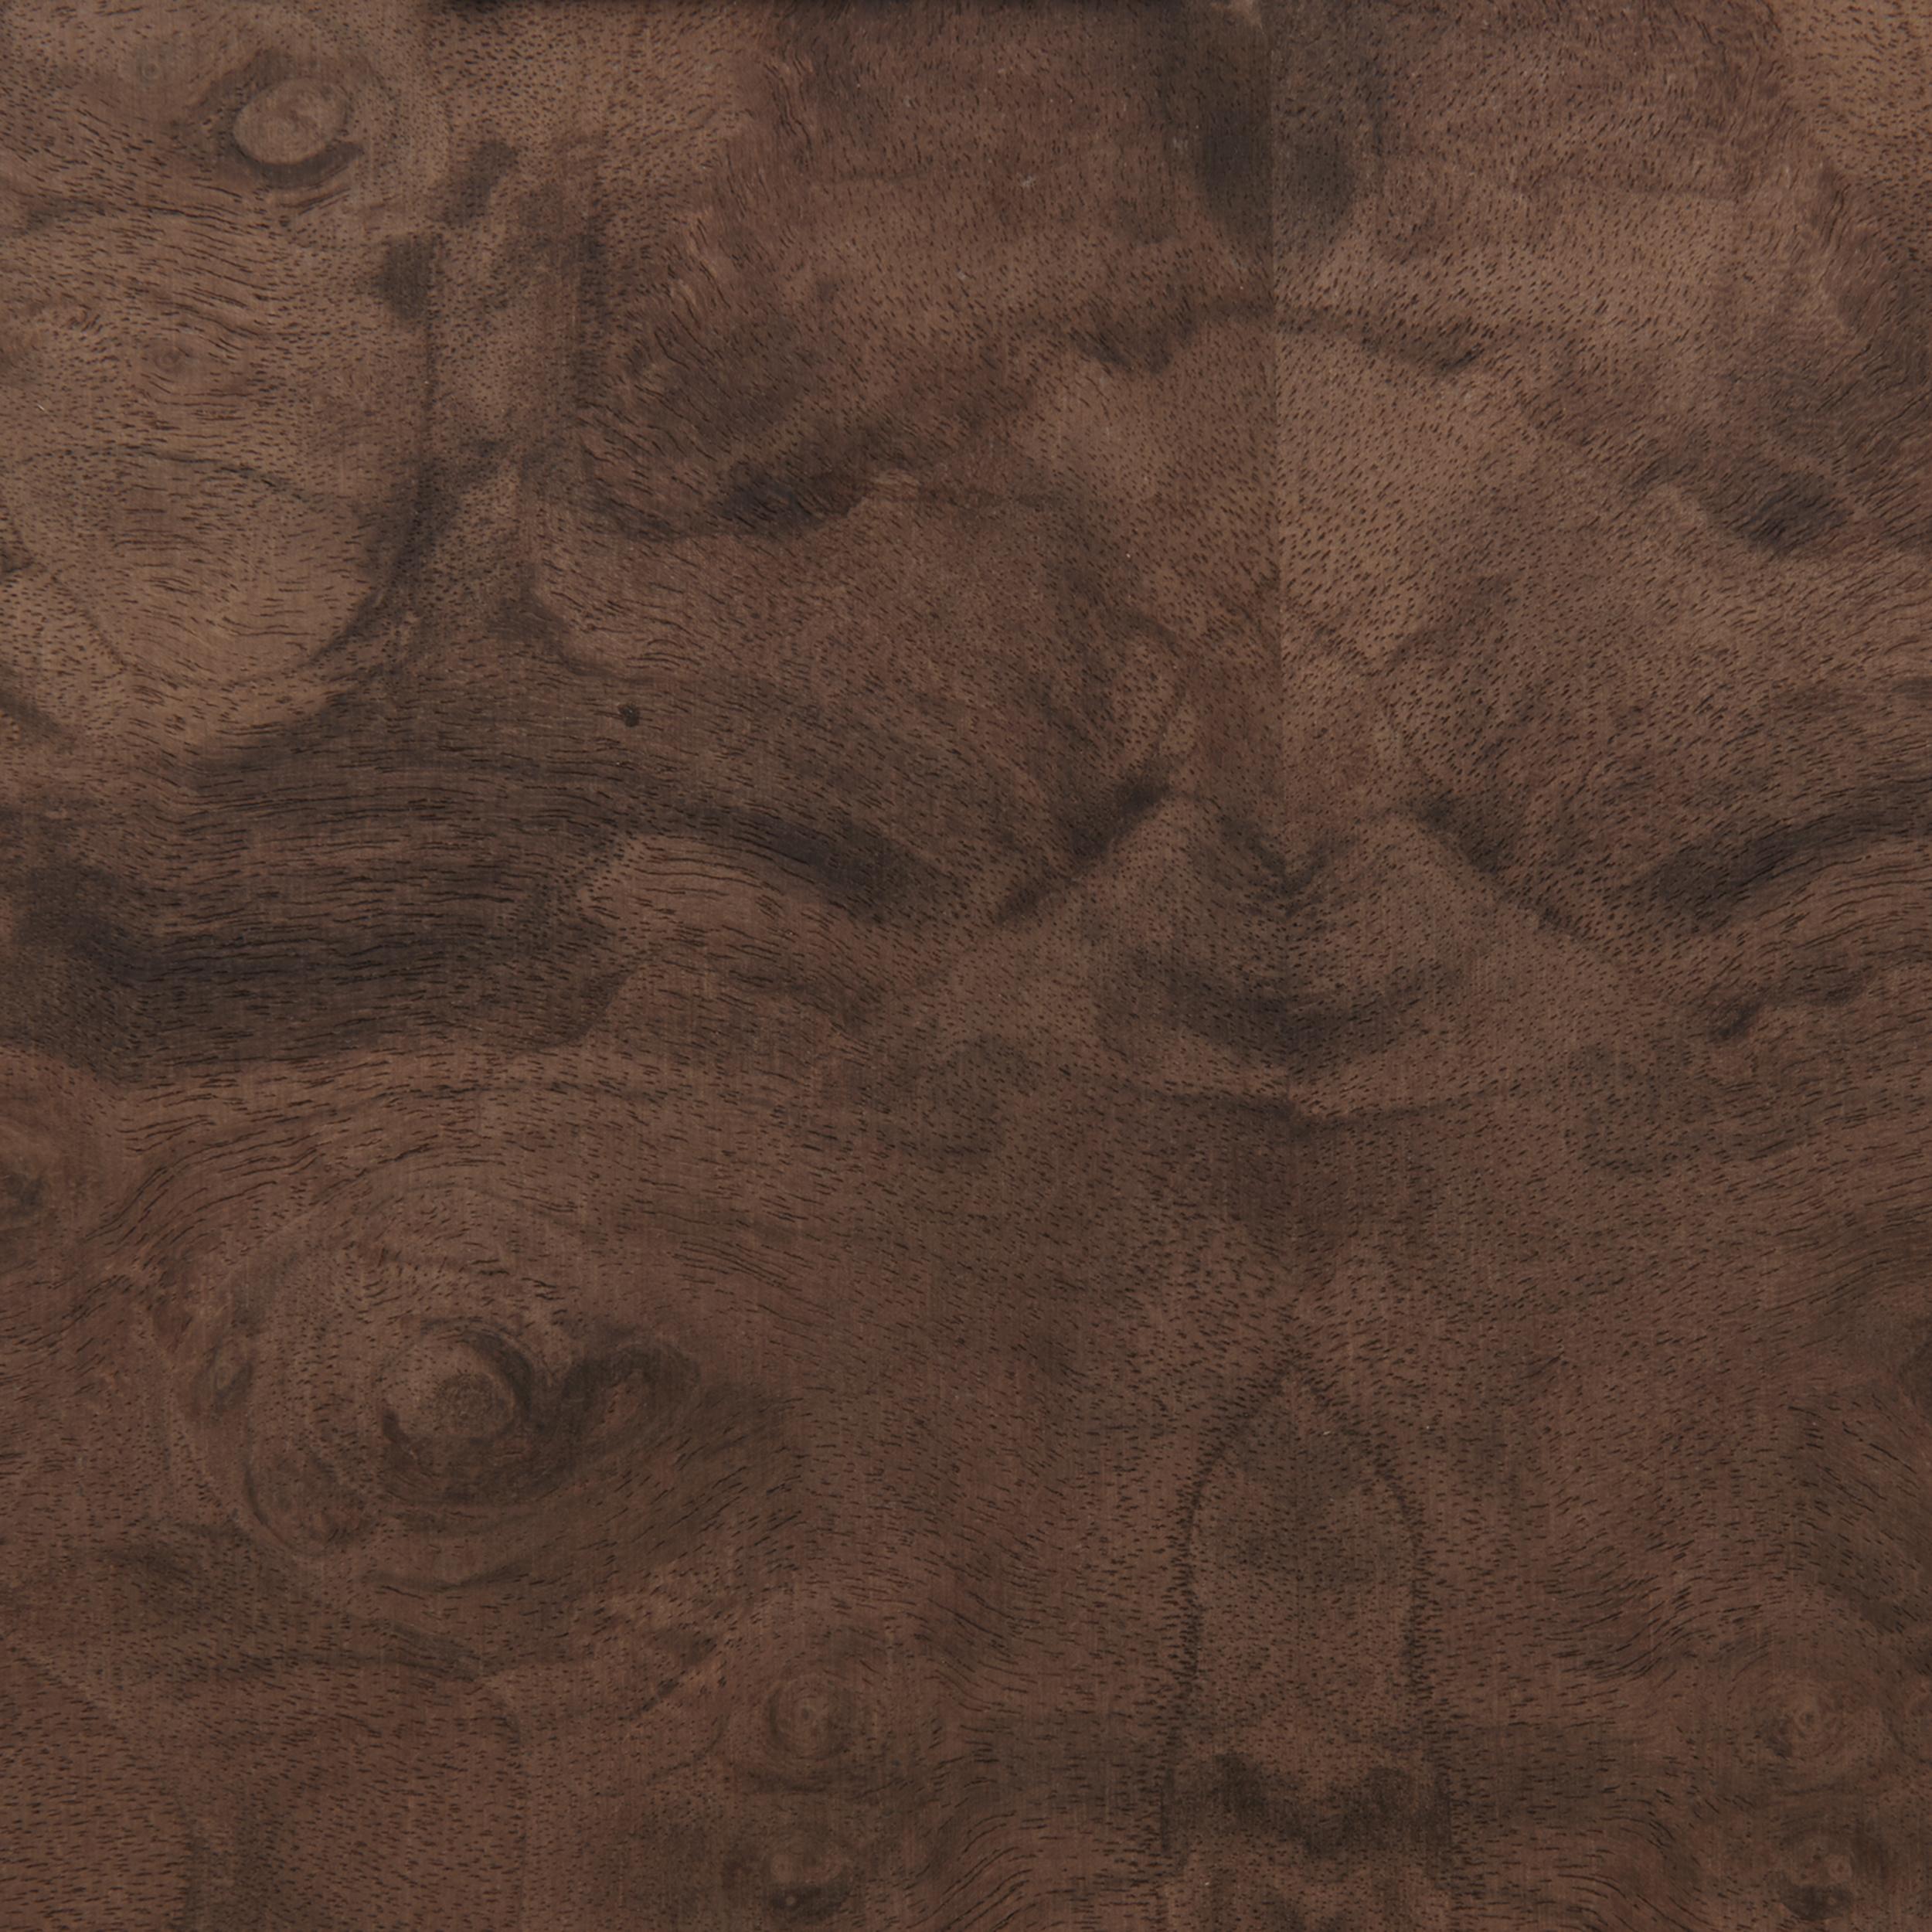 Walnut Burl 4' x 8' Veneer Sheet, 3M PSA Backed